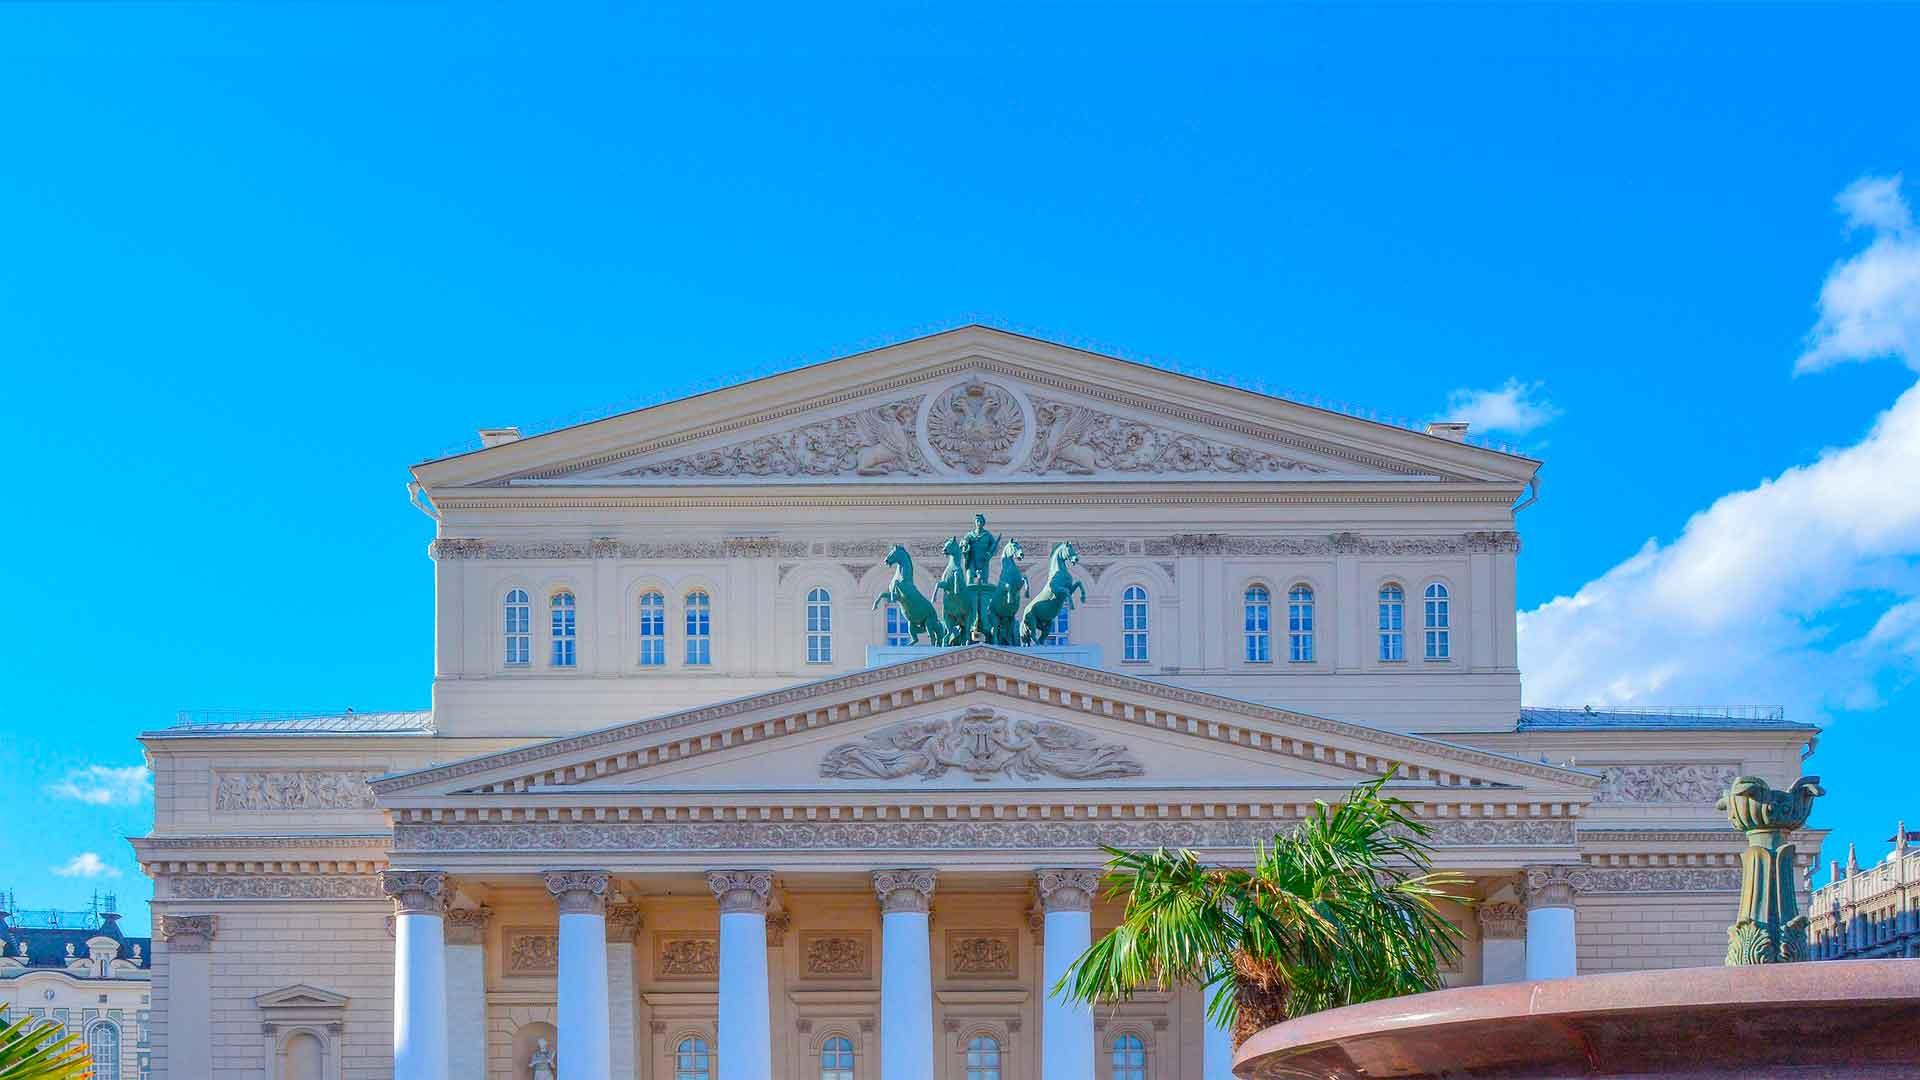 La catedral del ballet hero asset